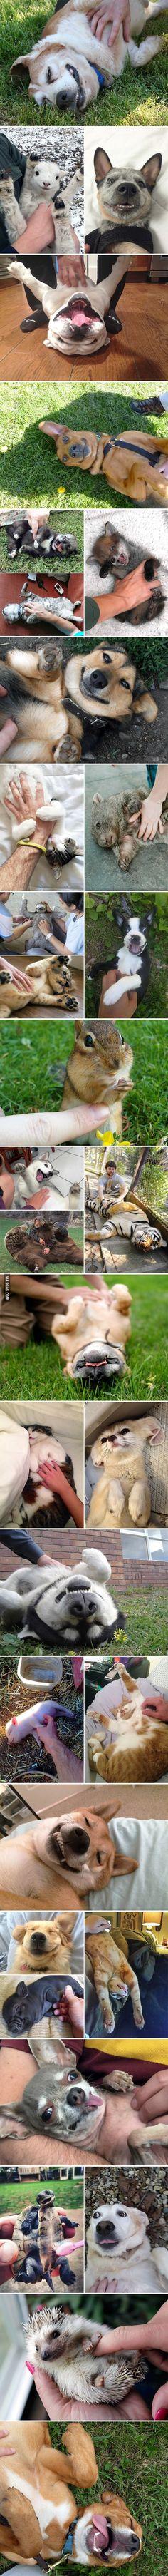 Just some animals enjoying belly rubs